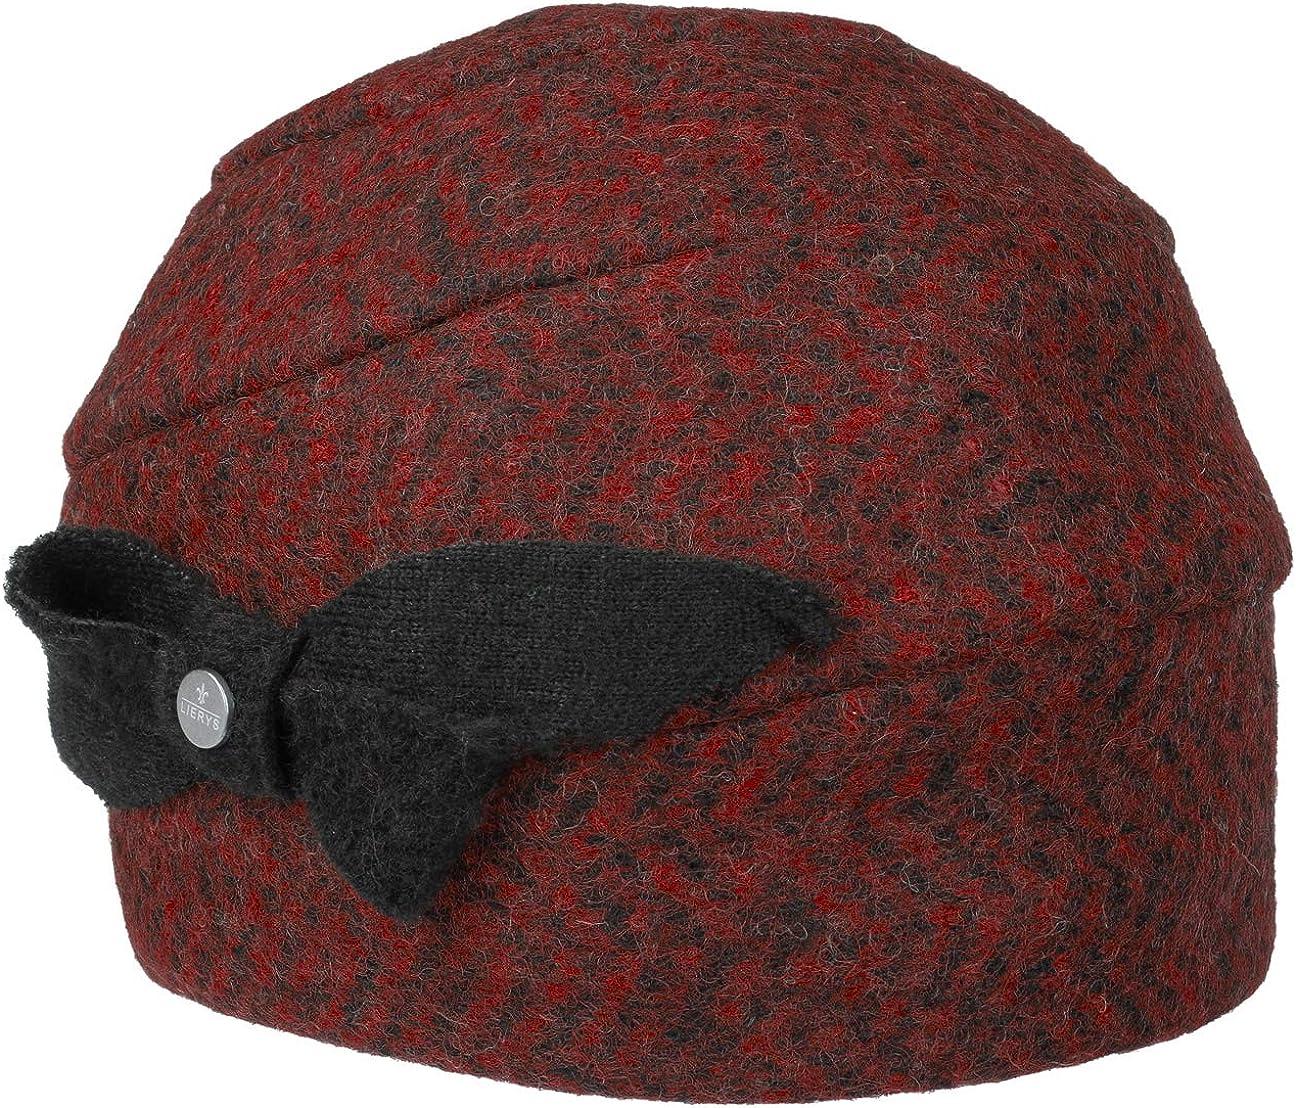 Lierys Linvisa Wool Beanie Hat Women - Made in Italy